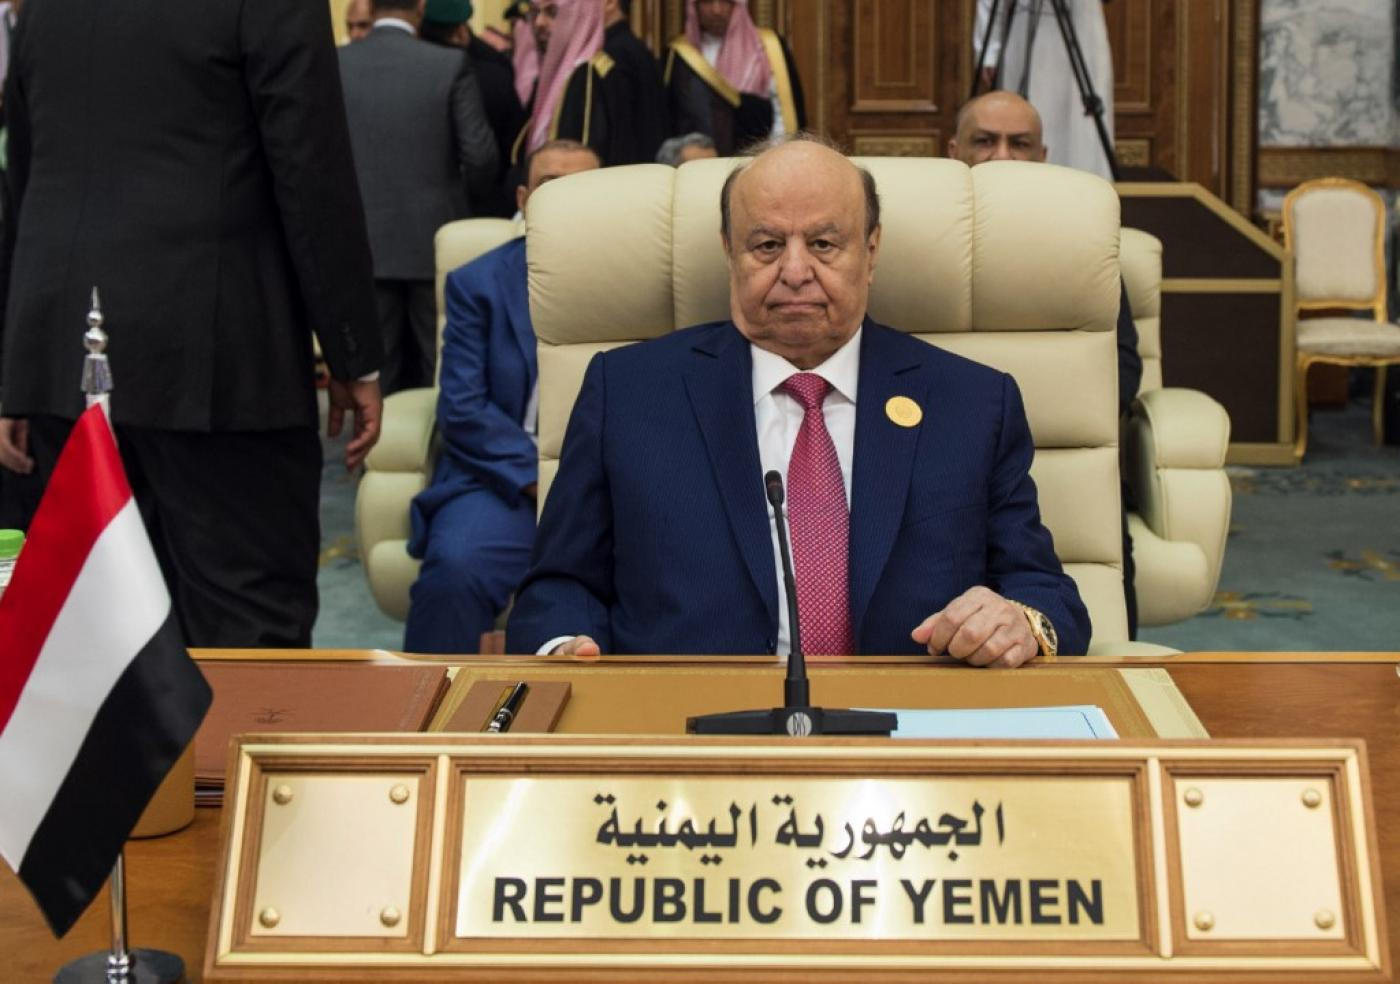 Saudi puppet': Yemenis question their president's legitimacy ...